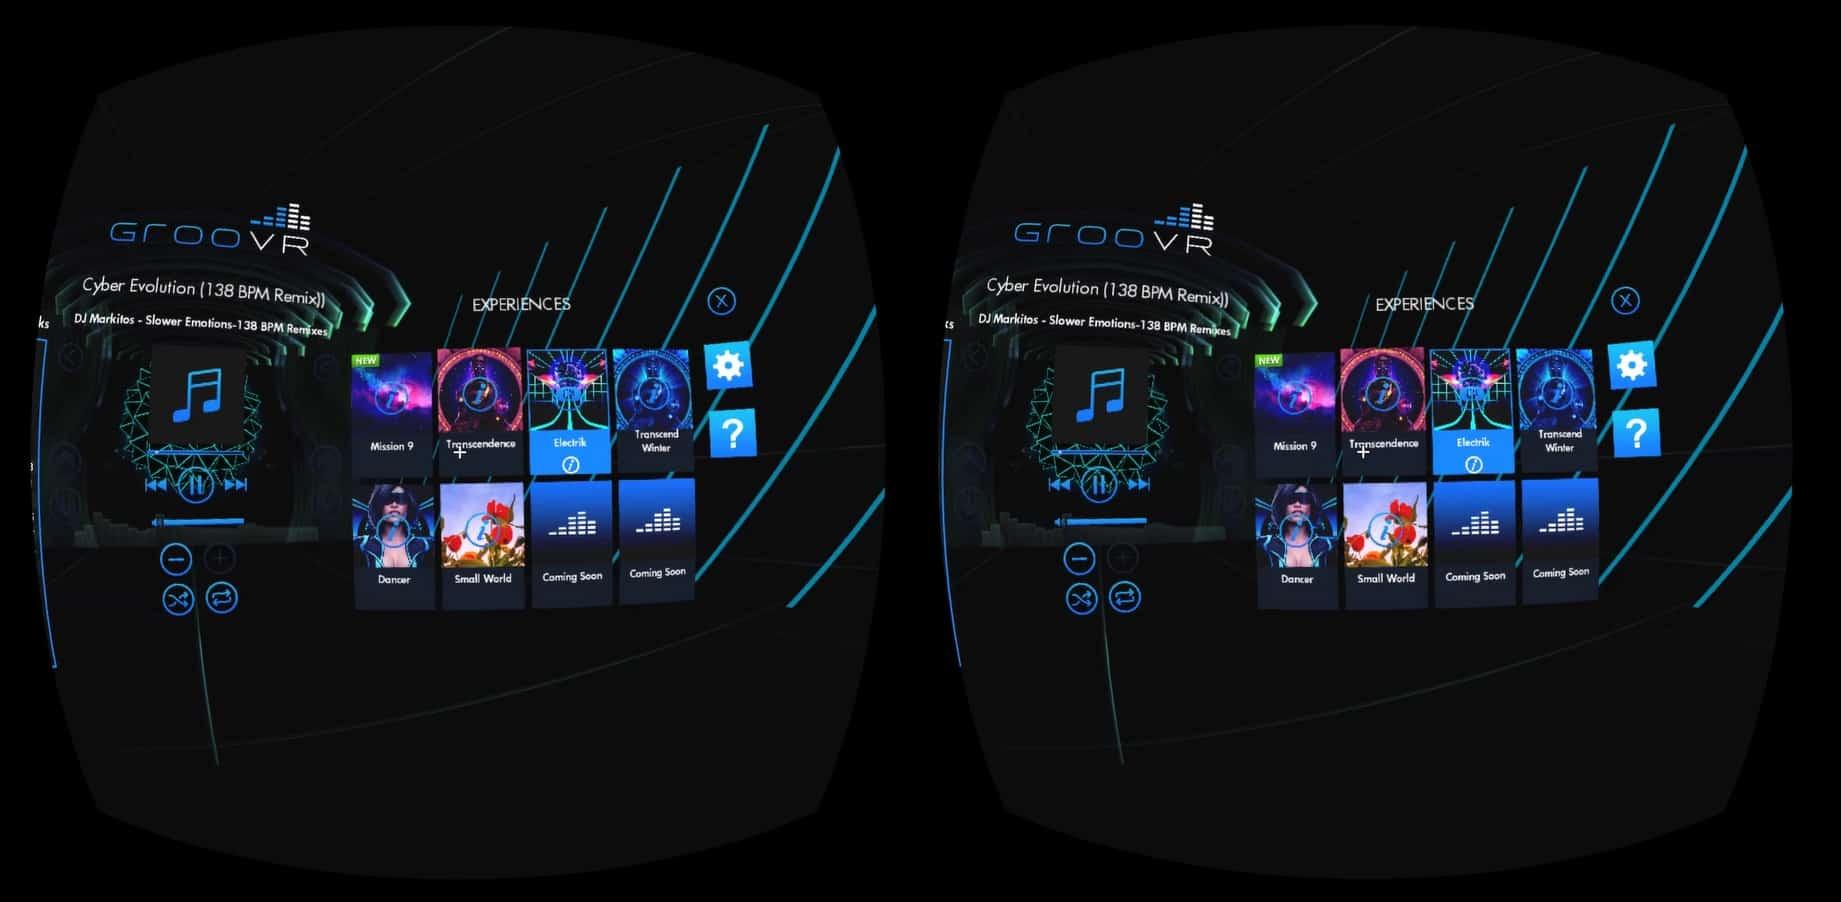 Samsung Vr Games >> Samsung Gear VR tip: screenshot maken (update: eenvoudiger nu!) - Galaxy Club - dé ...